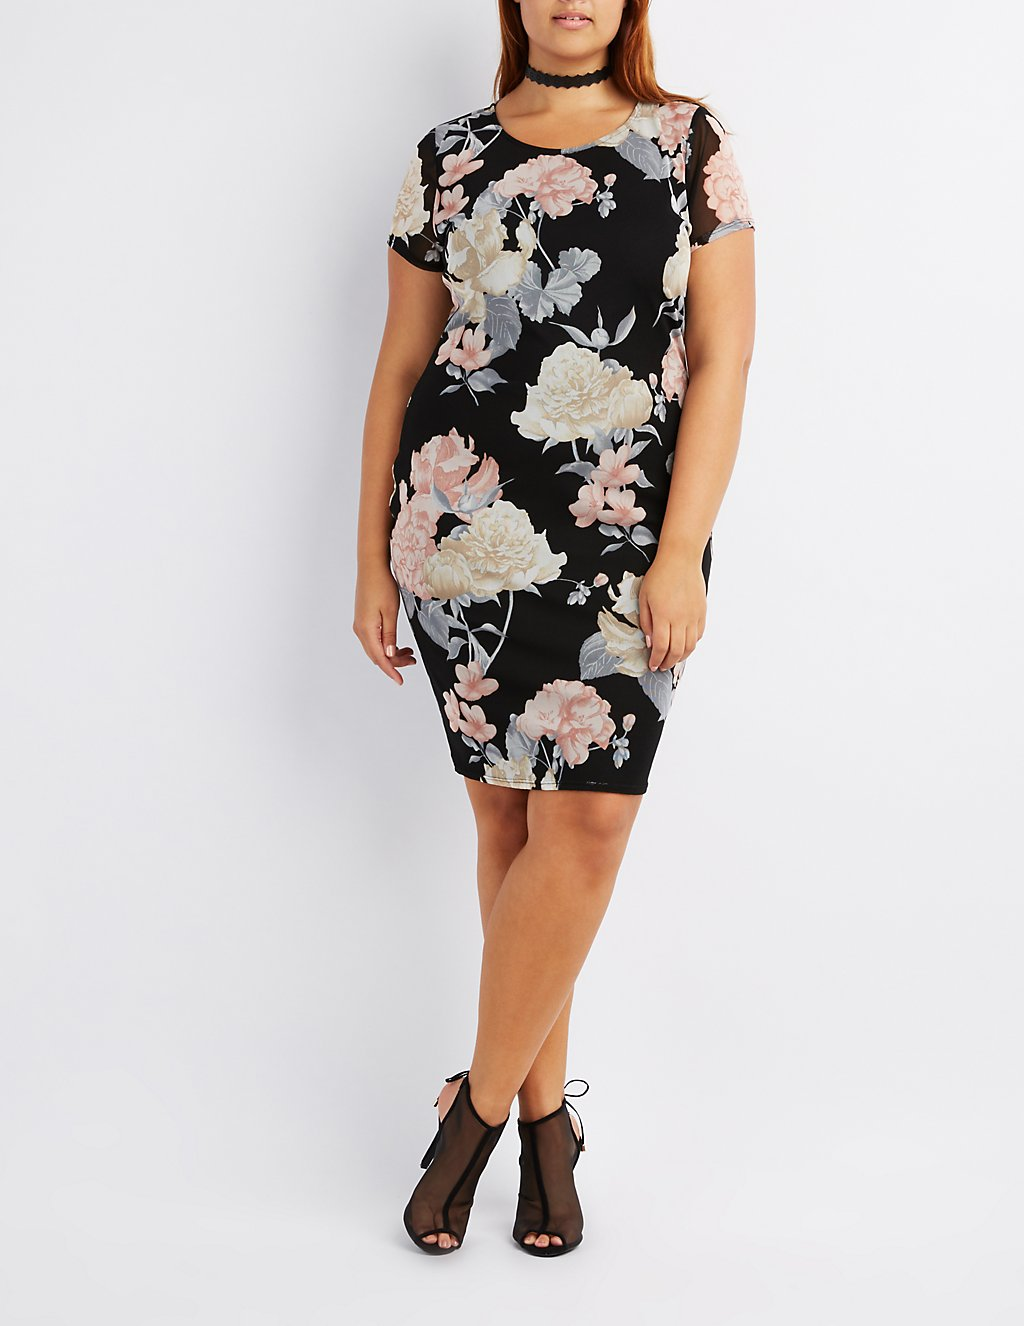 Plus Size Floral Mesh Bodycon Dress   Charlotte Russe